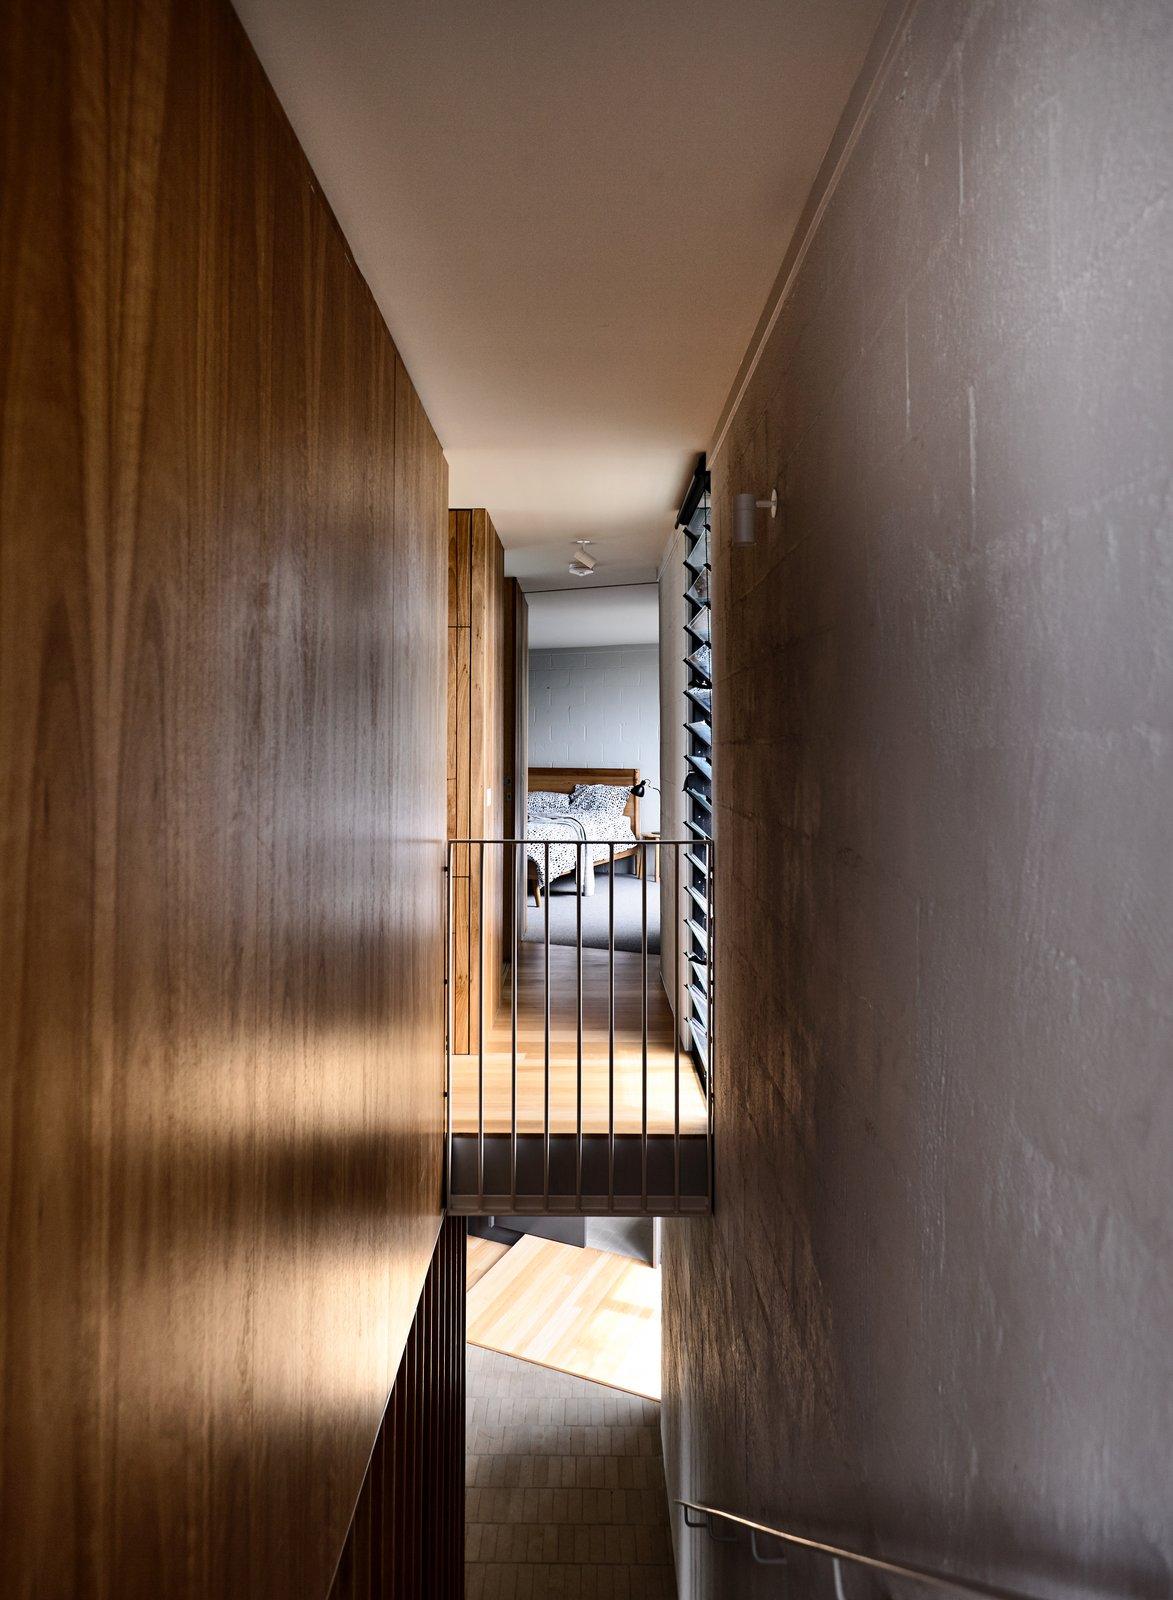 Sorrento House Figureground Architecture Stairwell